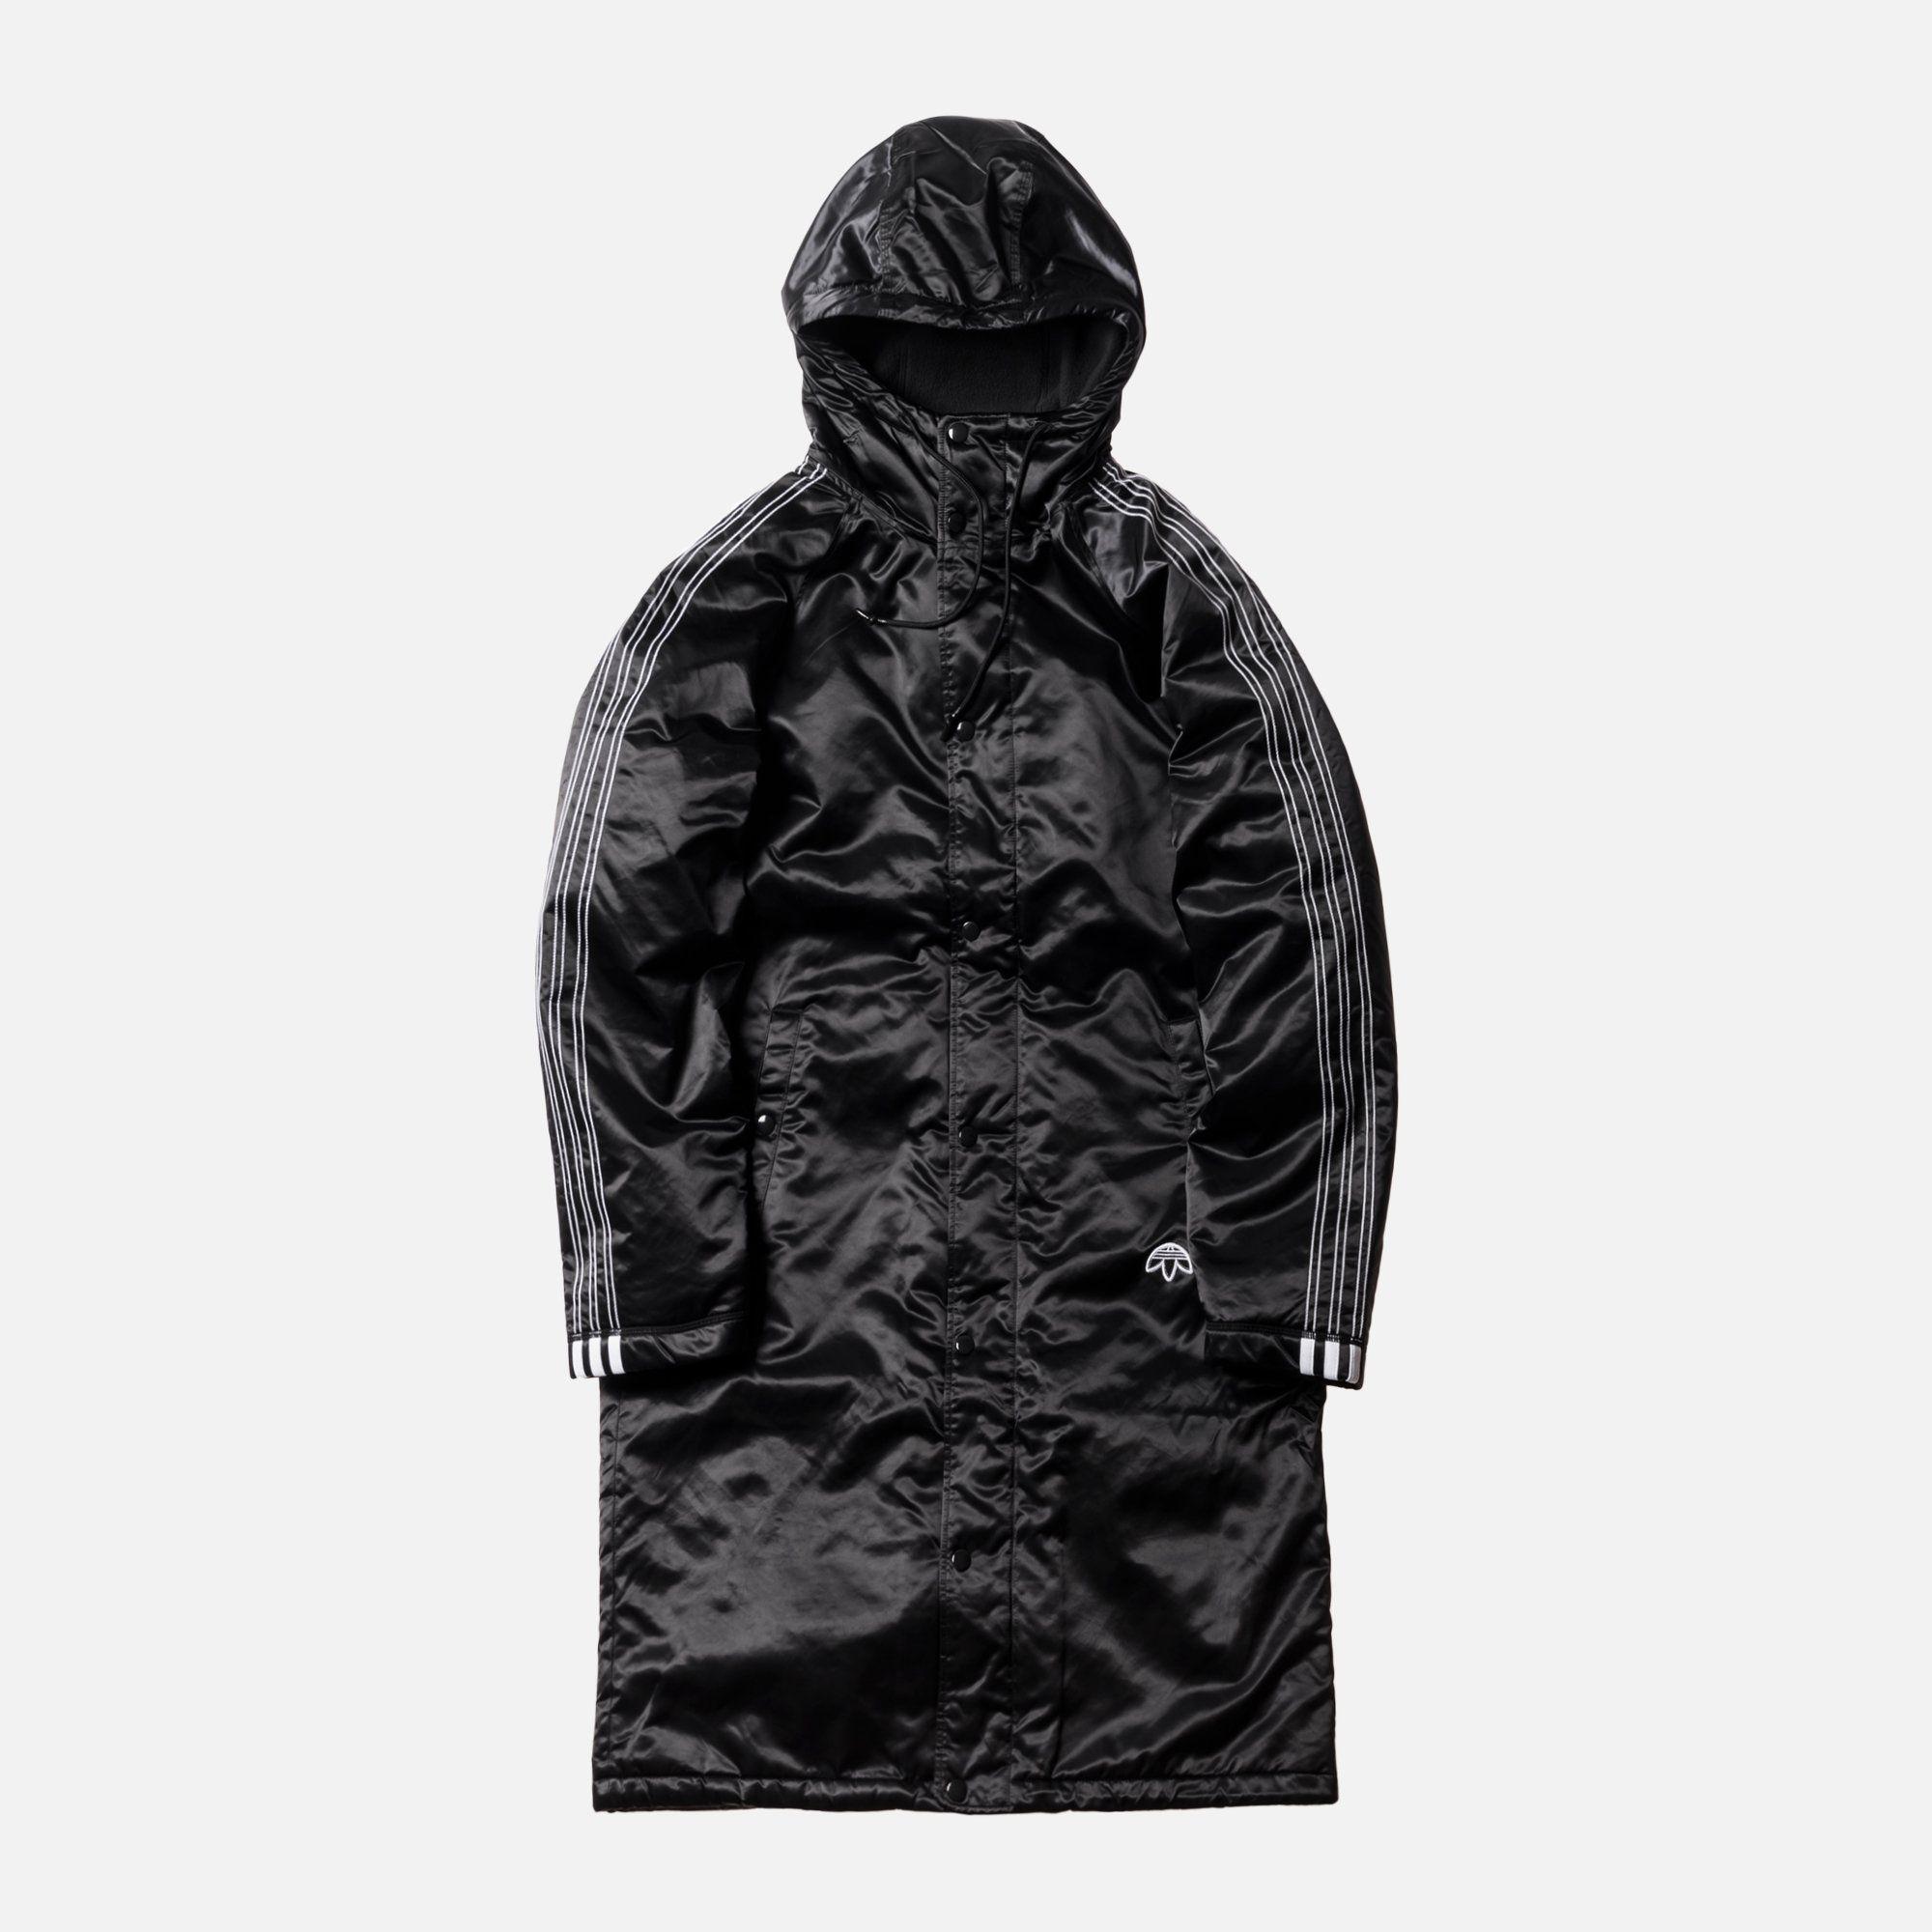 sale uk recognized brands official store adidas Originals by Alexander Wang Stadium Jacket - Black ...